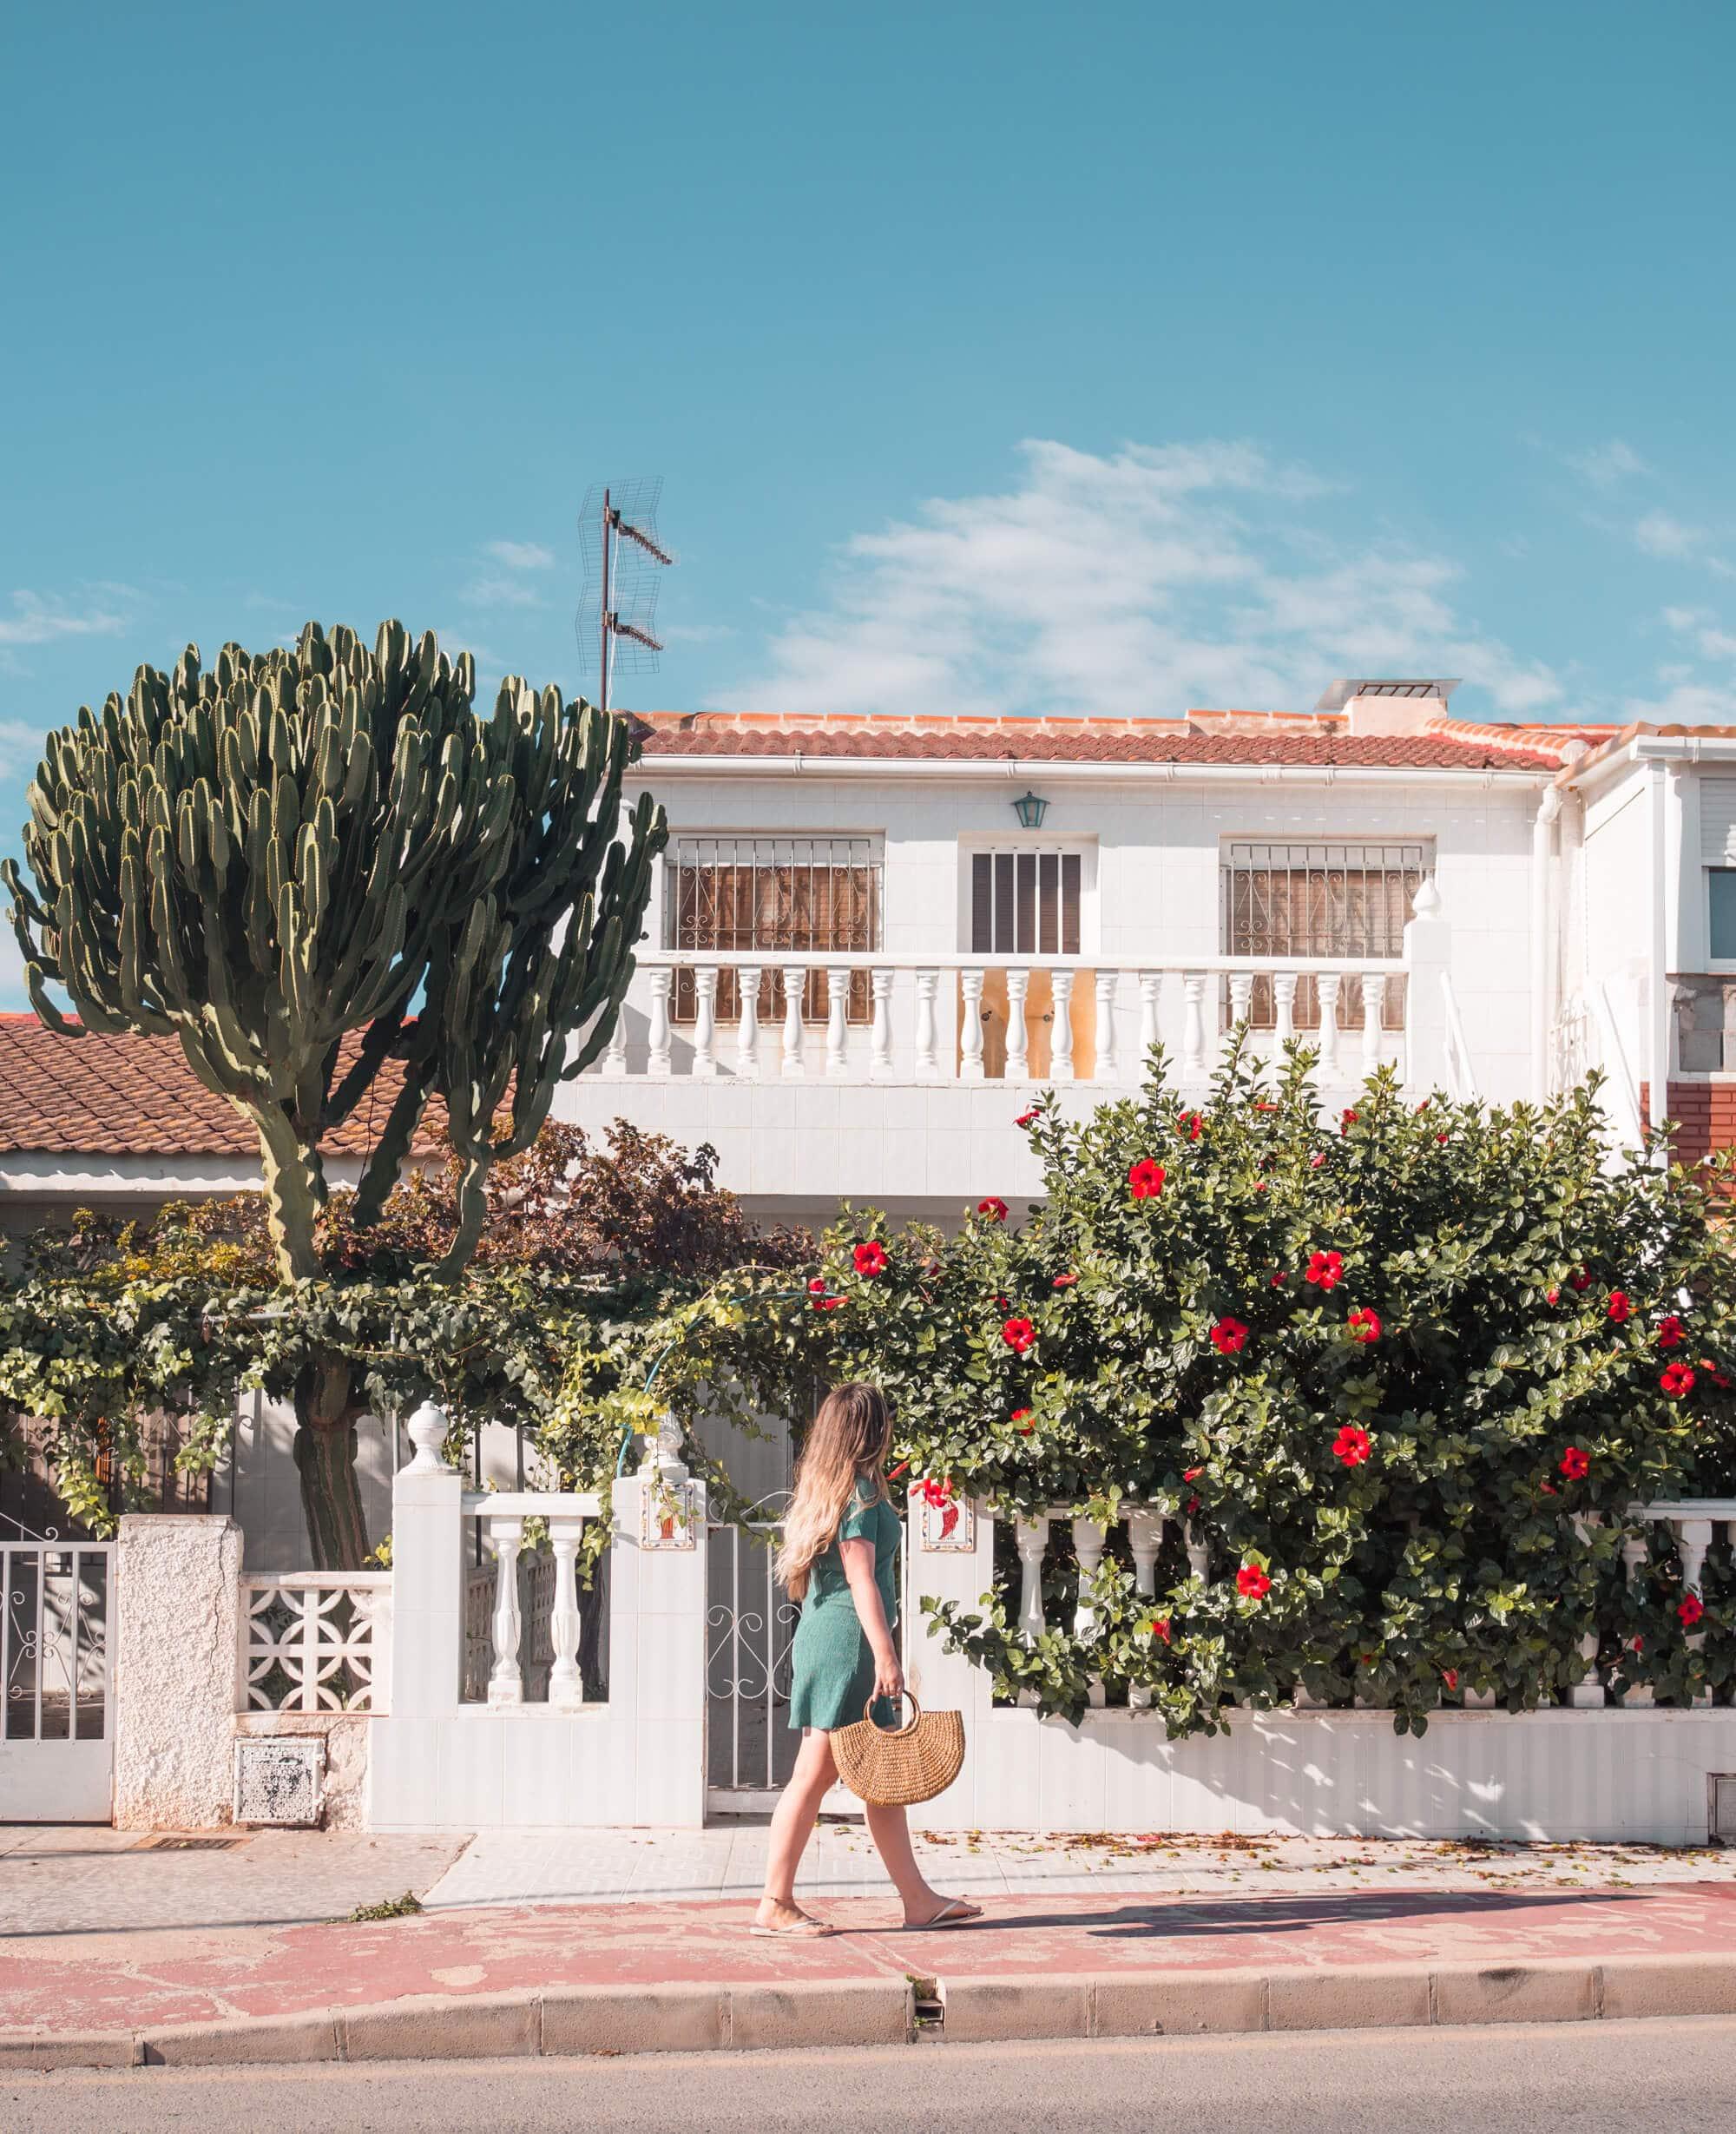 Beautiful street in Torrevieja Spain - Home to the pink salt lake #spain #torrevieja #alicante #bucketlist #travelinspo